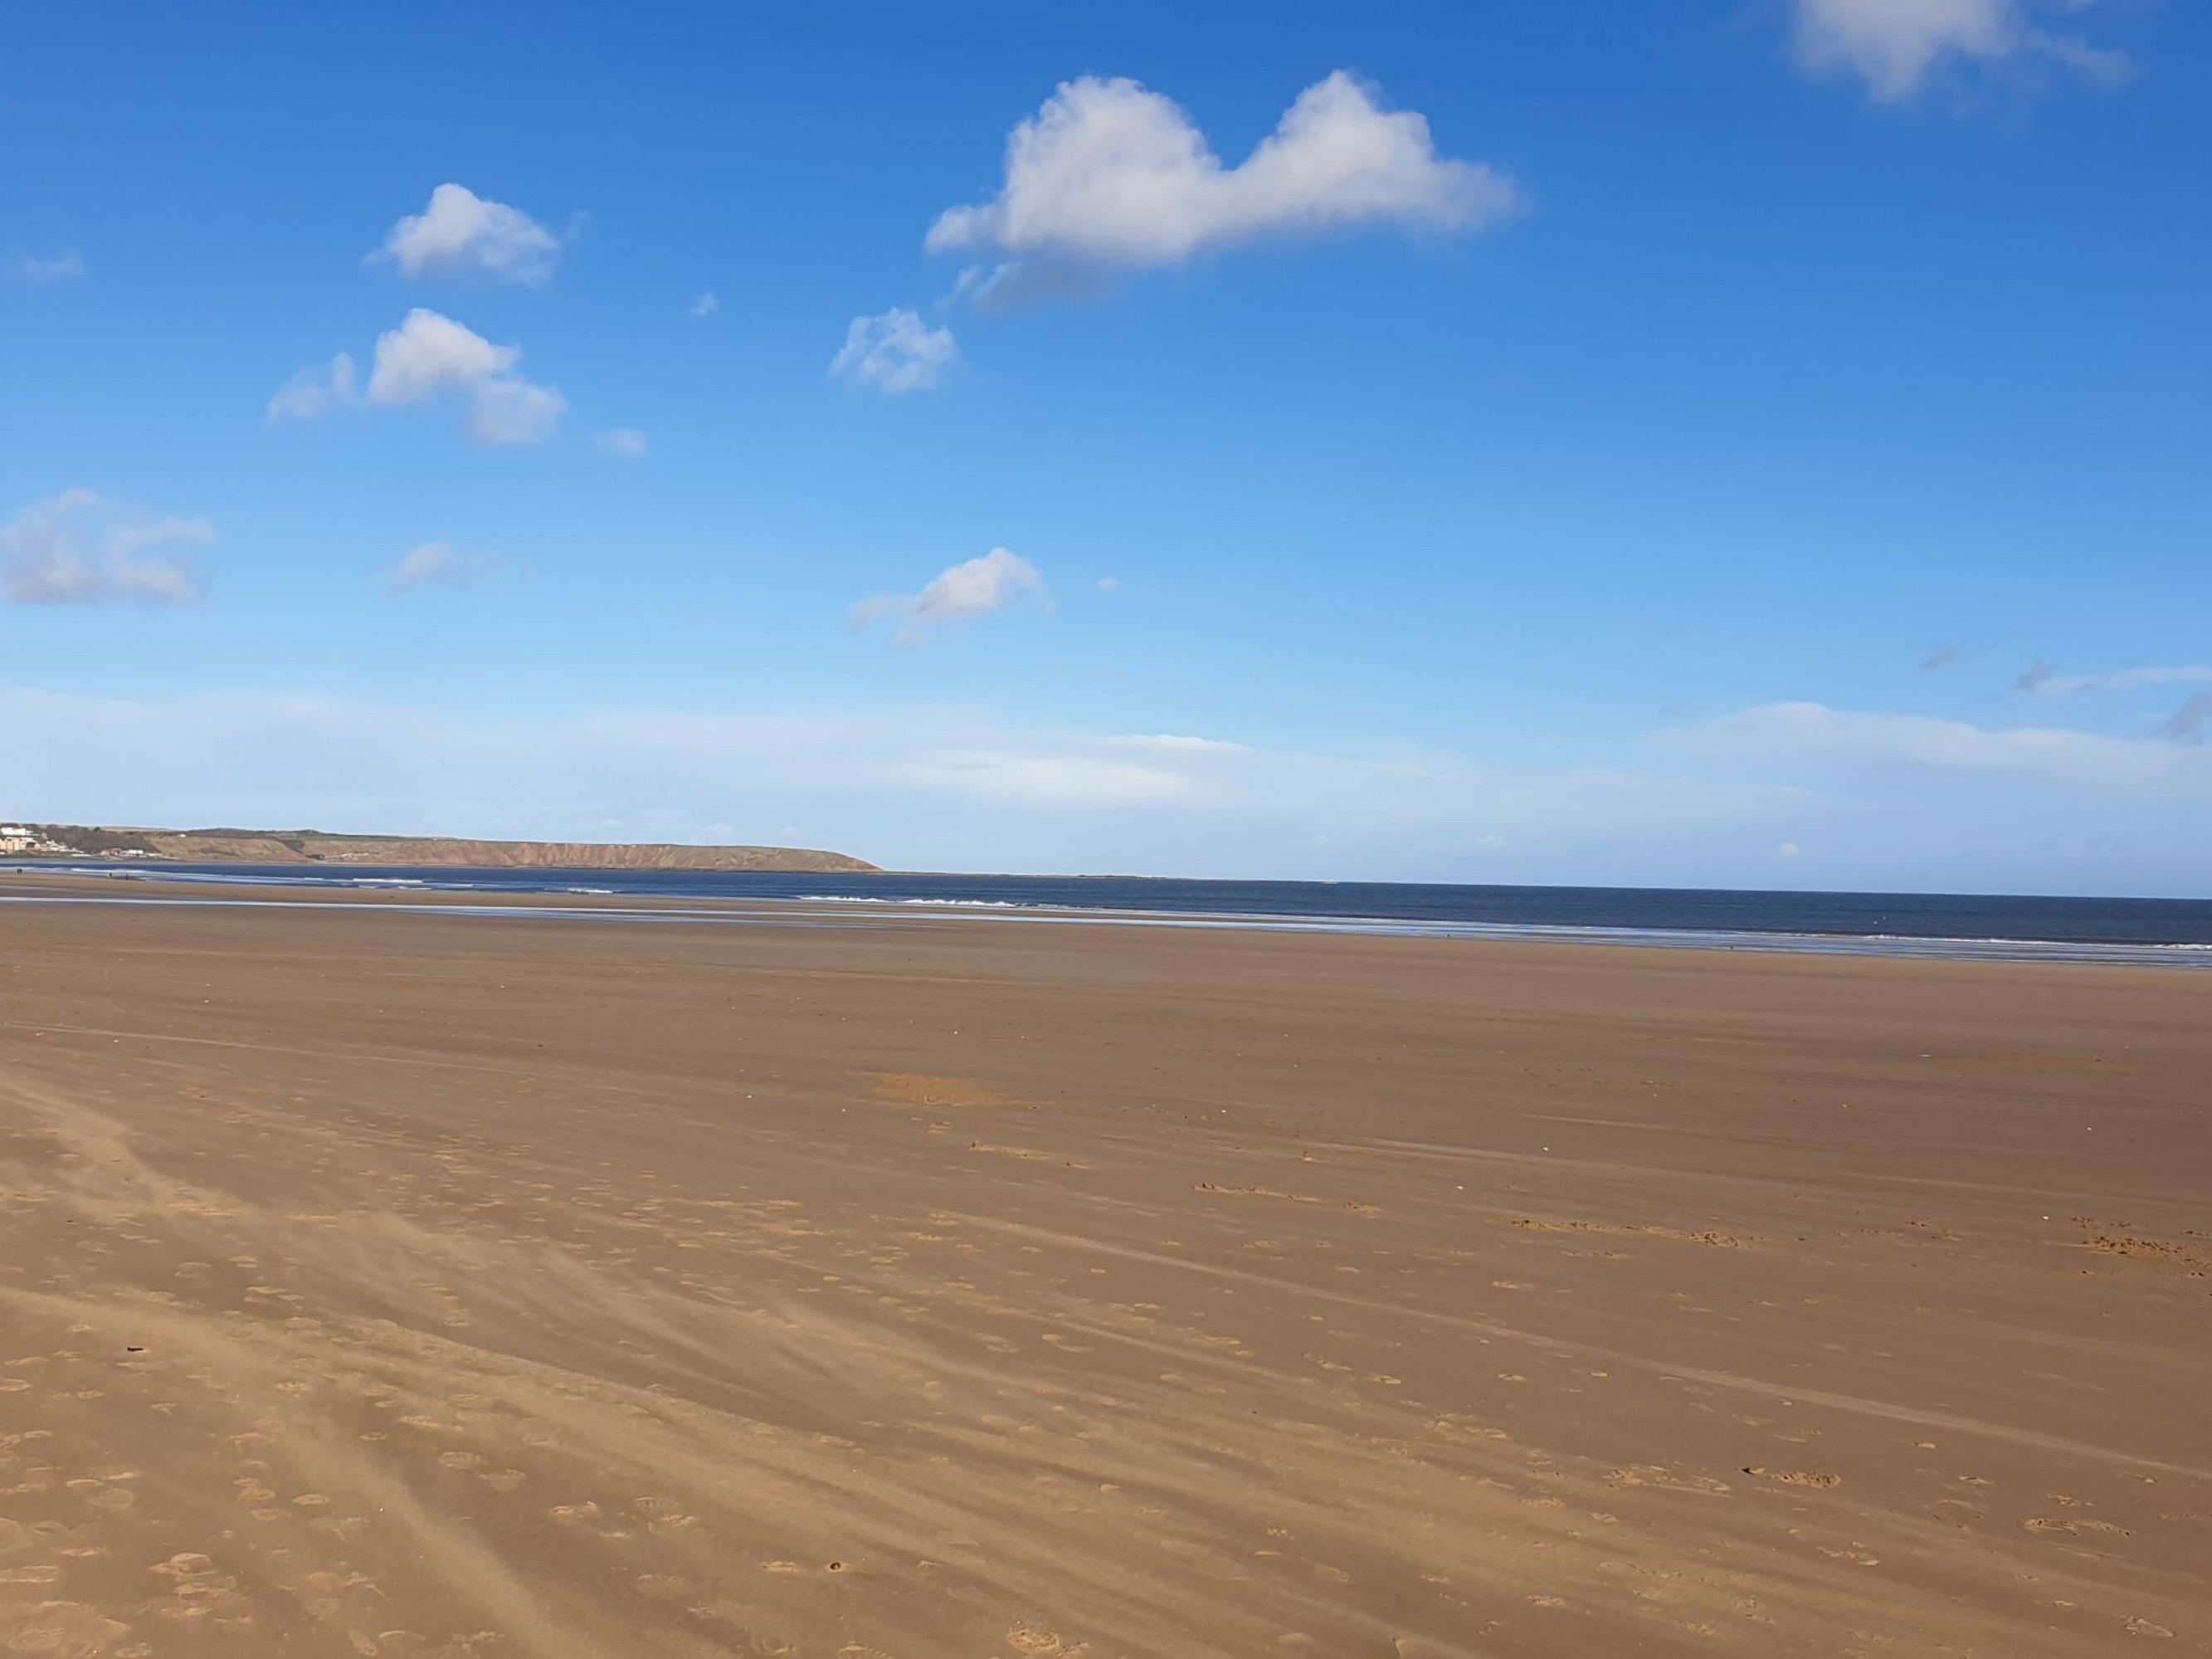 Yorkshire coast blue skies and sandy beaches